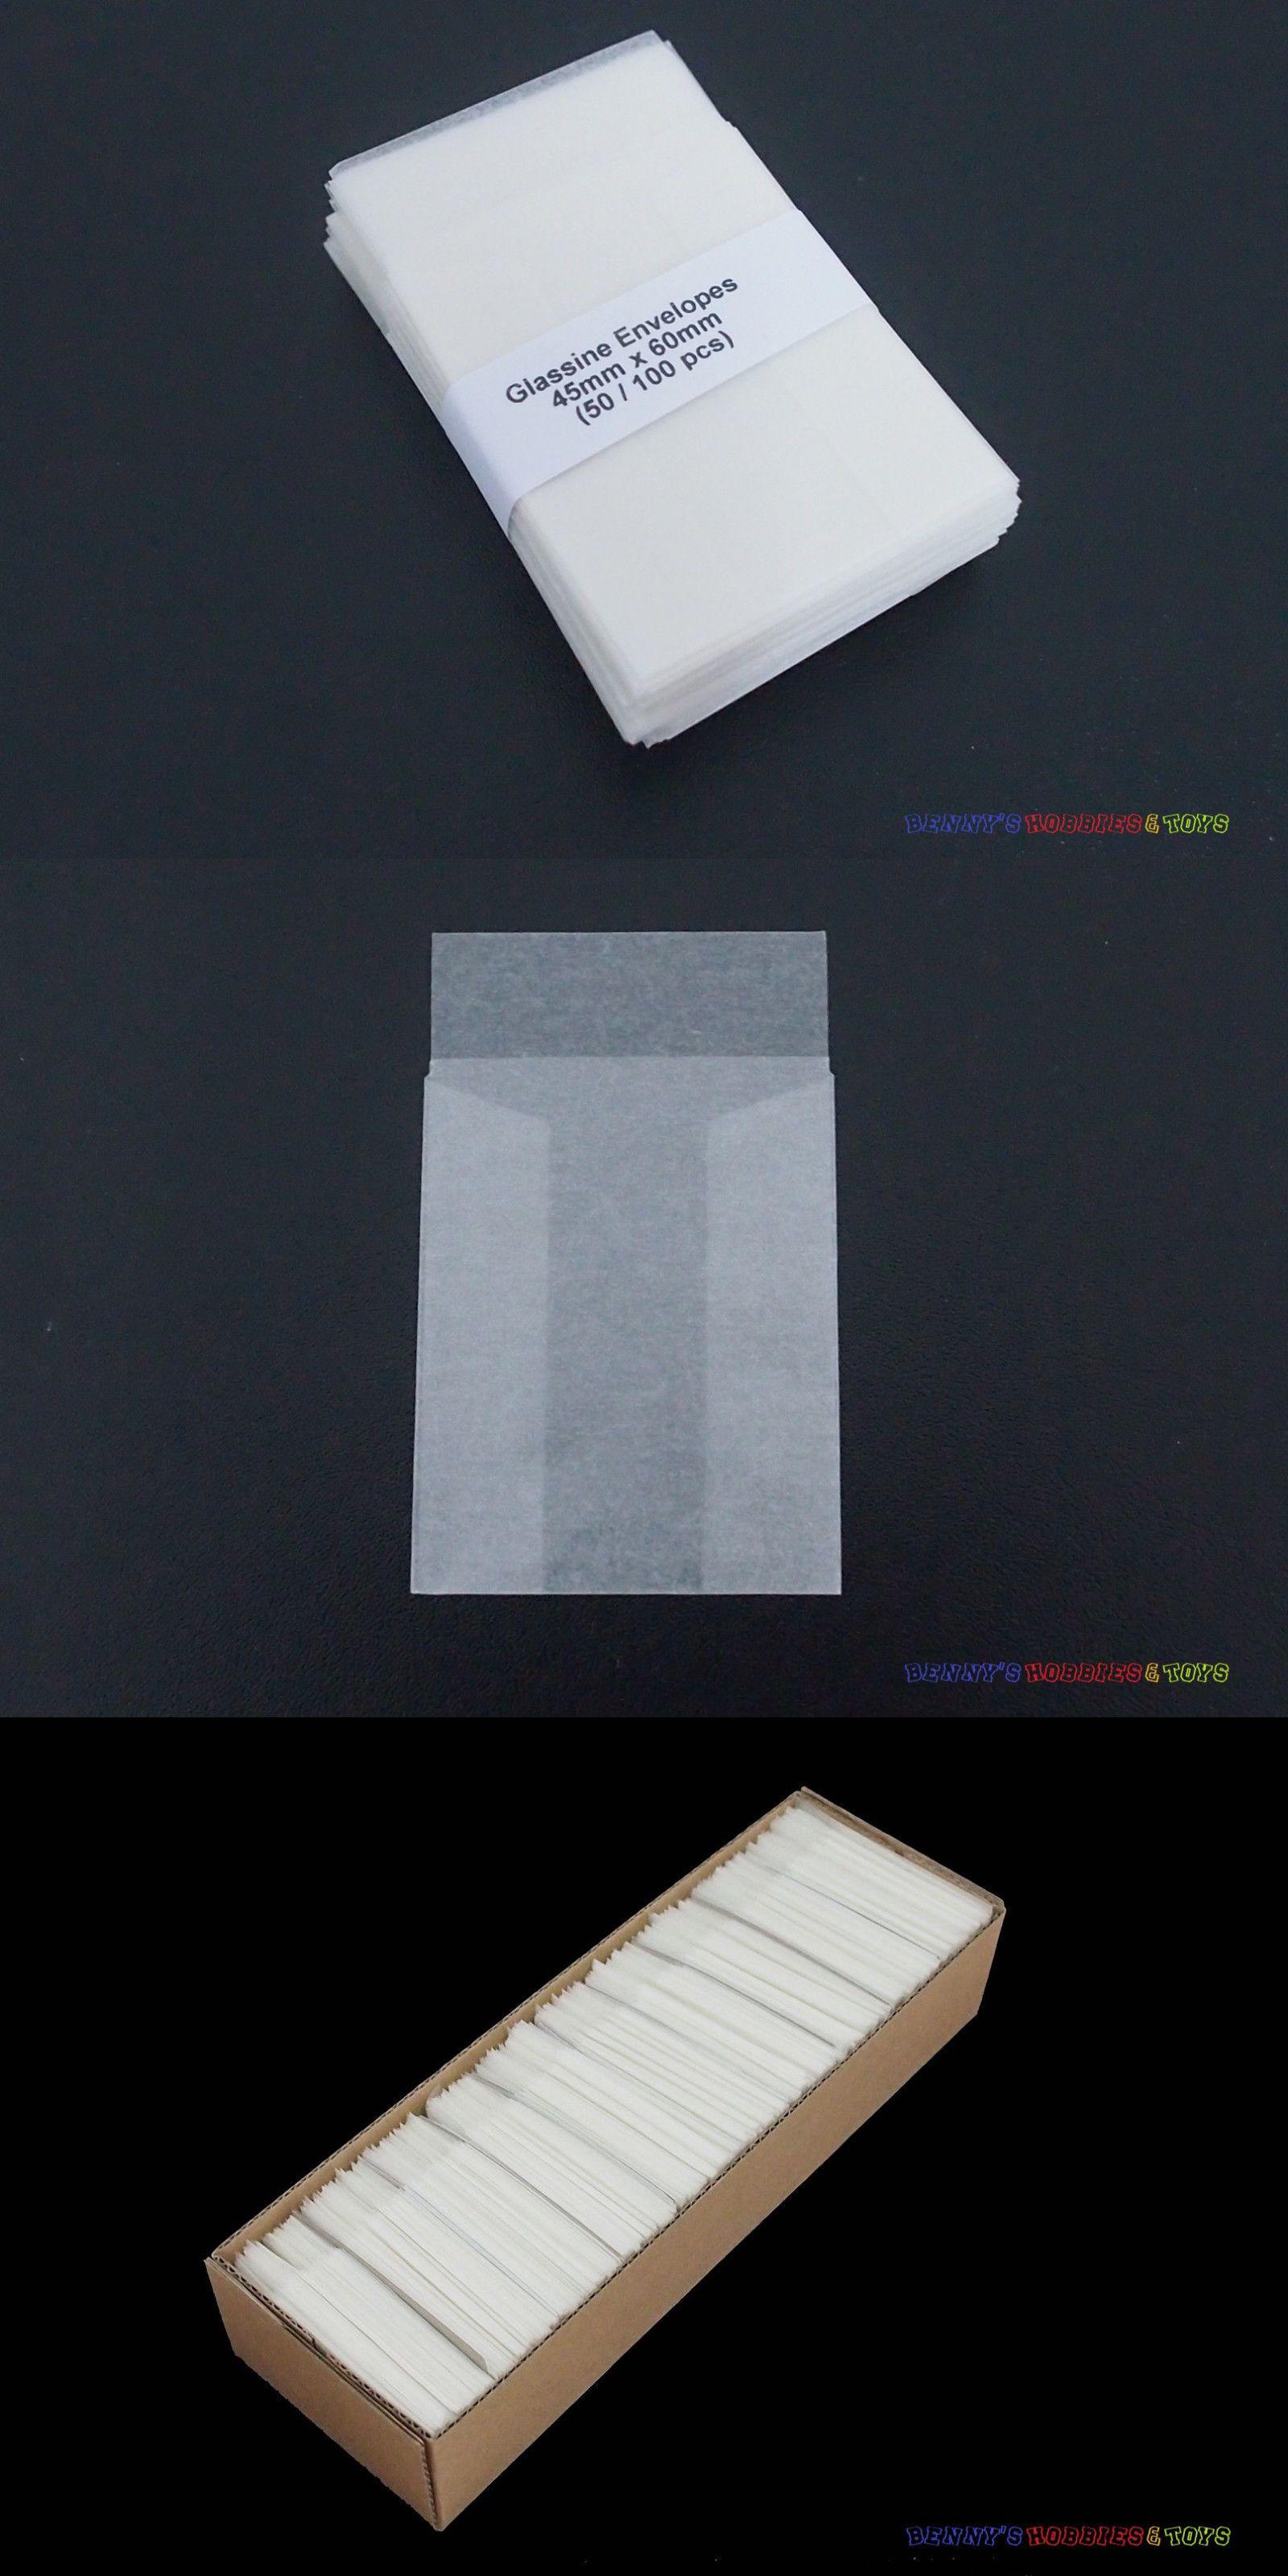 Protective Envelopes 82978 500 New Glassine 45Mm X 60Mm